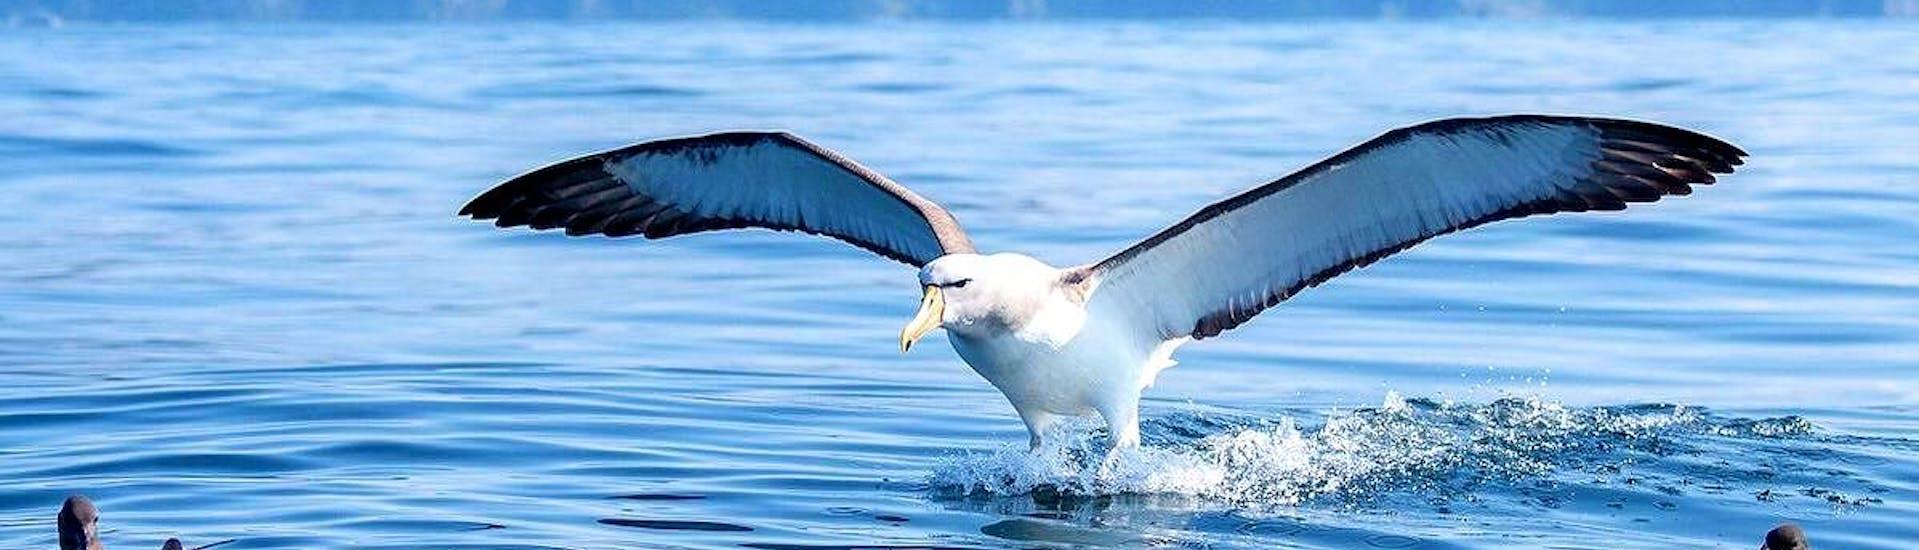 boat-trip-in-kaikoura-albatross-watching-albatross-encounter-kaikoura-hero